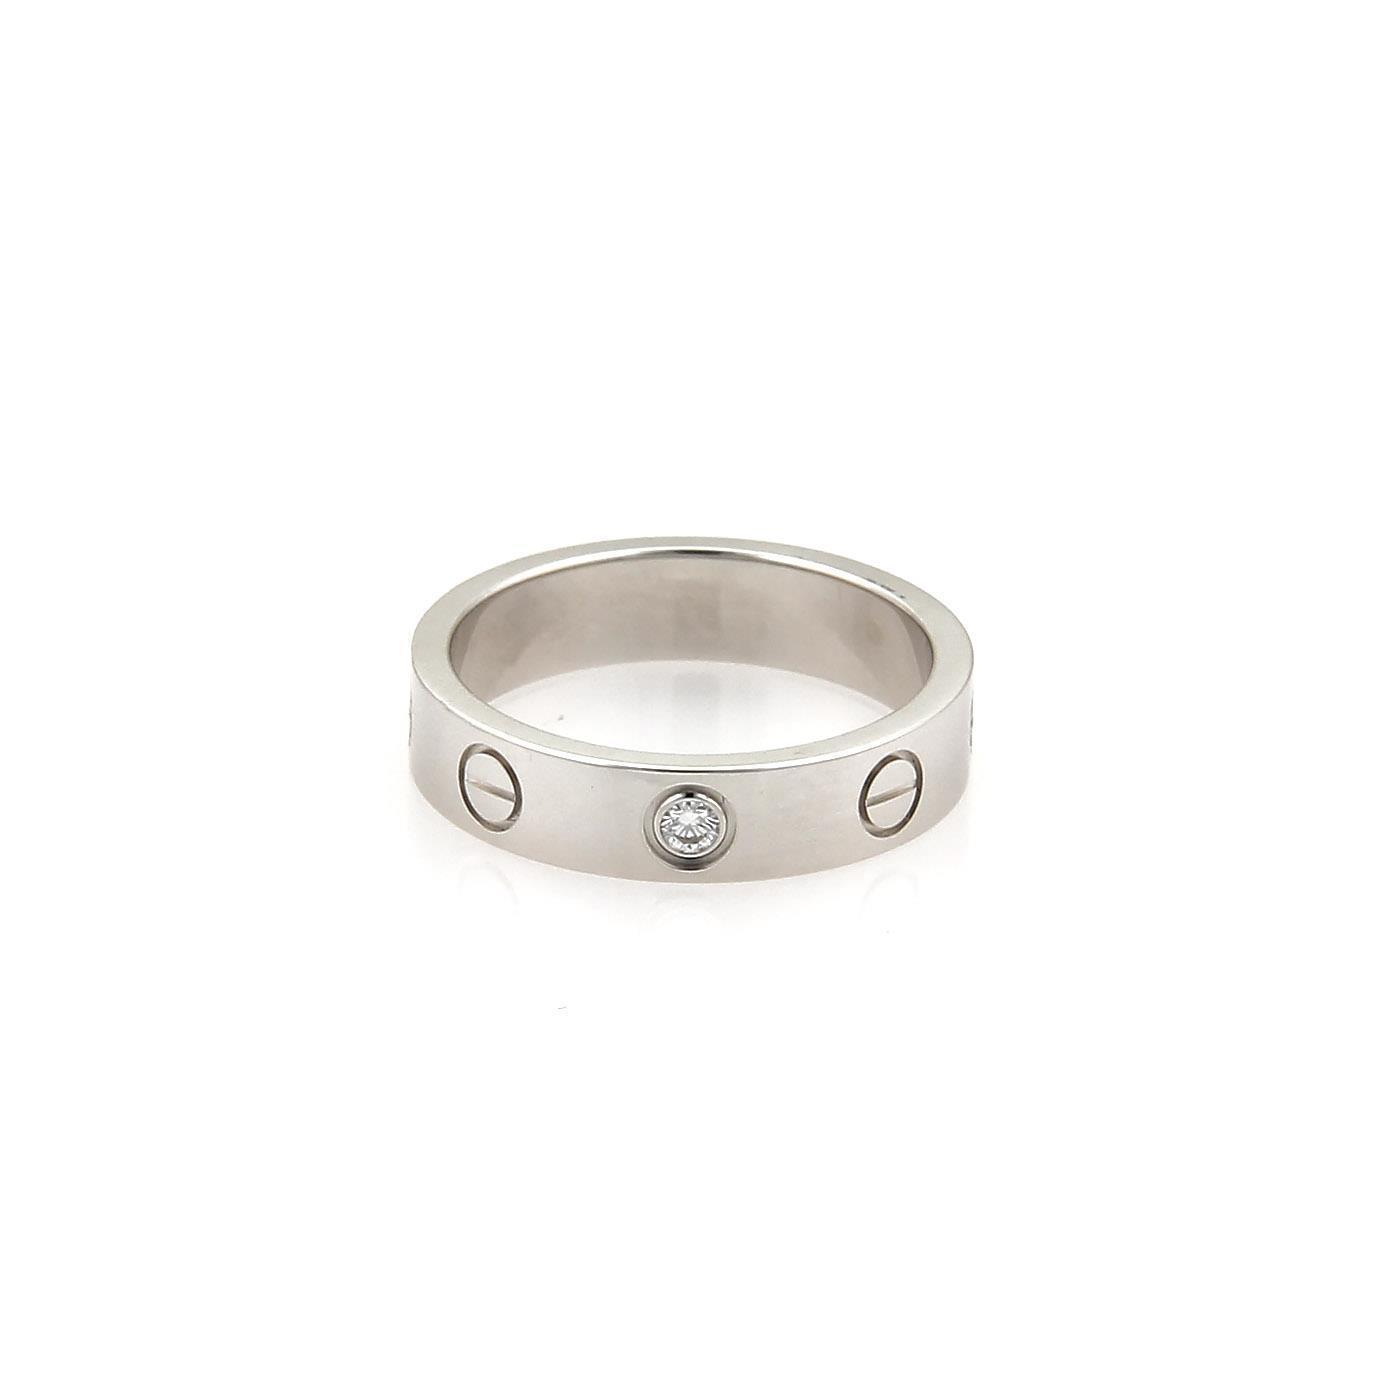 """""Cartier Mini Love 18K White Gold 0.05 Ct Diamond Band Ring Size 4.5"""""" 1070169"